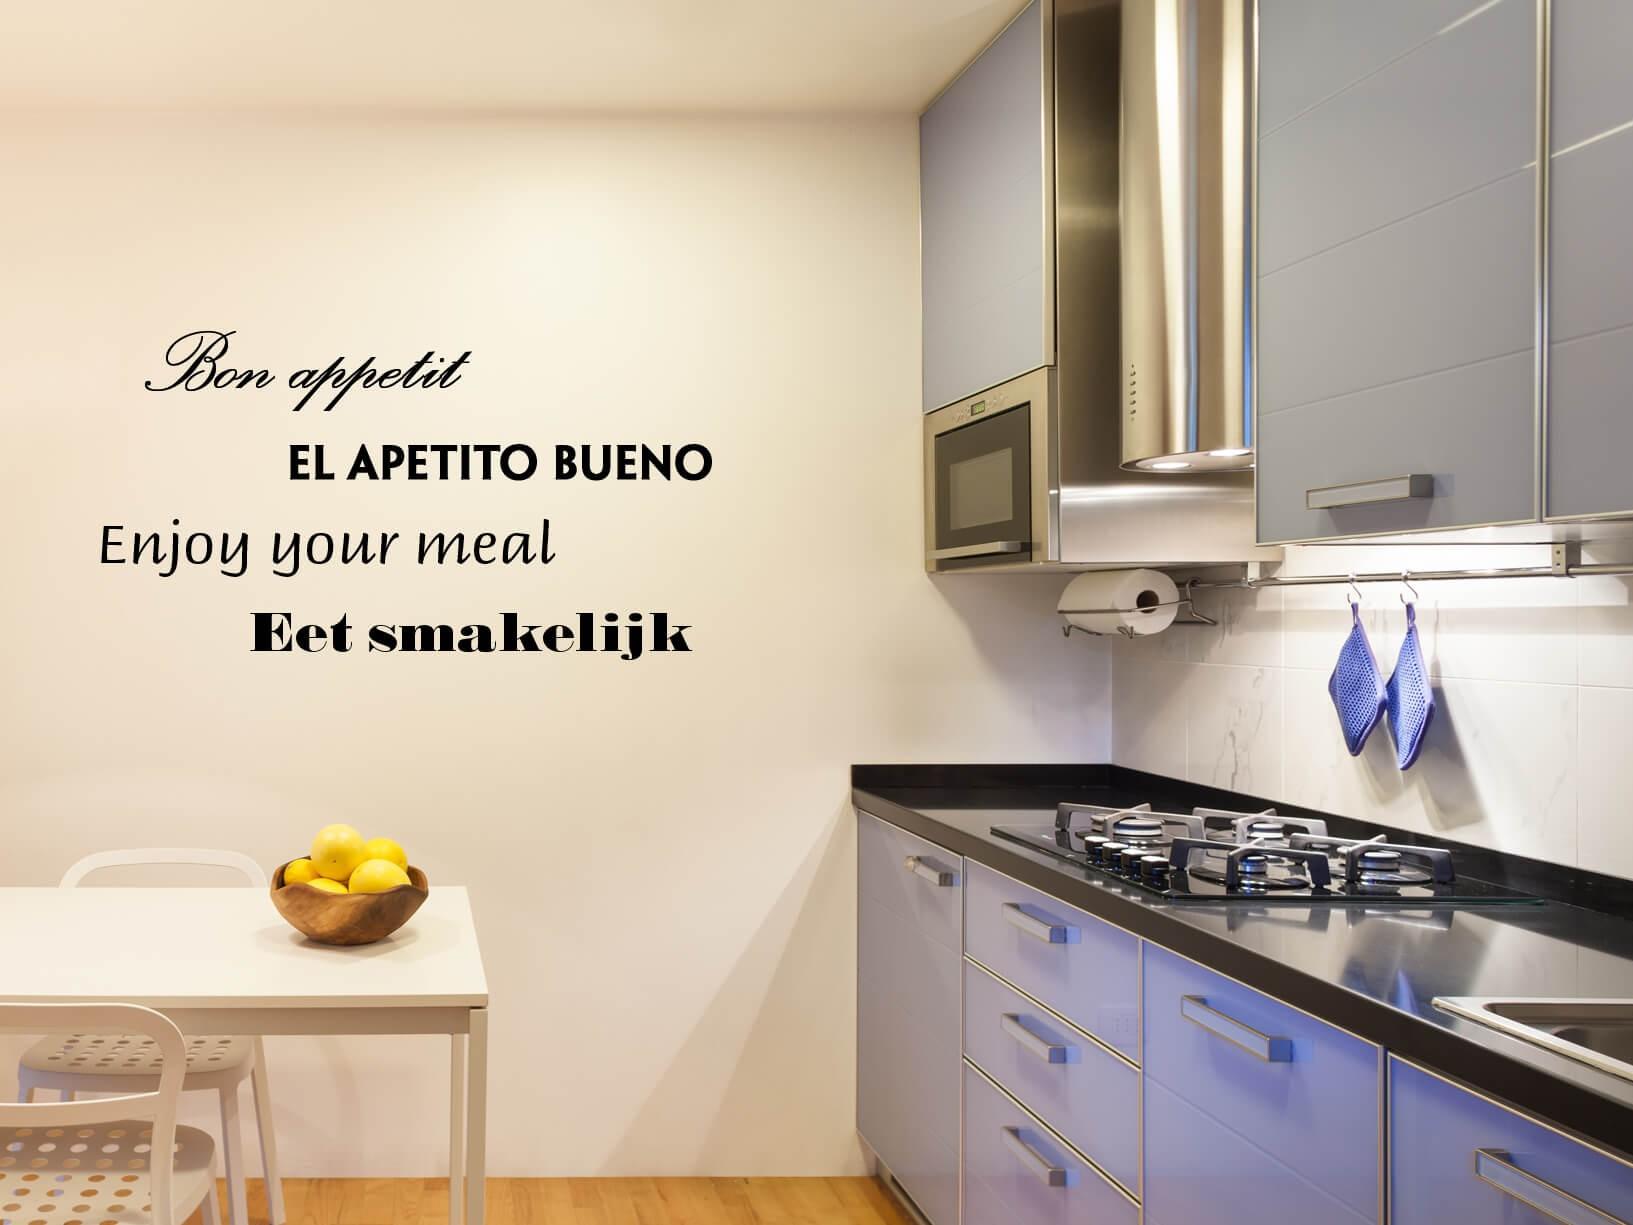 "Muurstickers Keuken Bon Appetit : Muursticker ""Bon Appetit, El apetito bueno, Enjoy your meal, Eet"